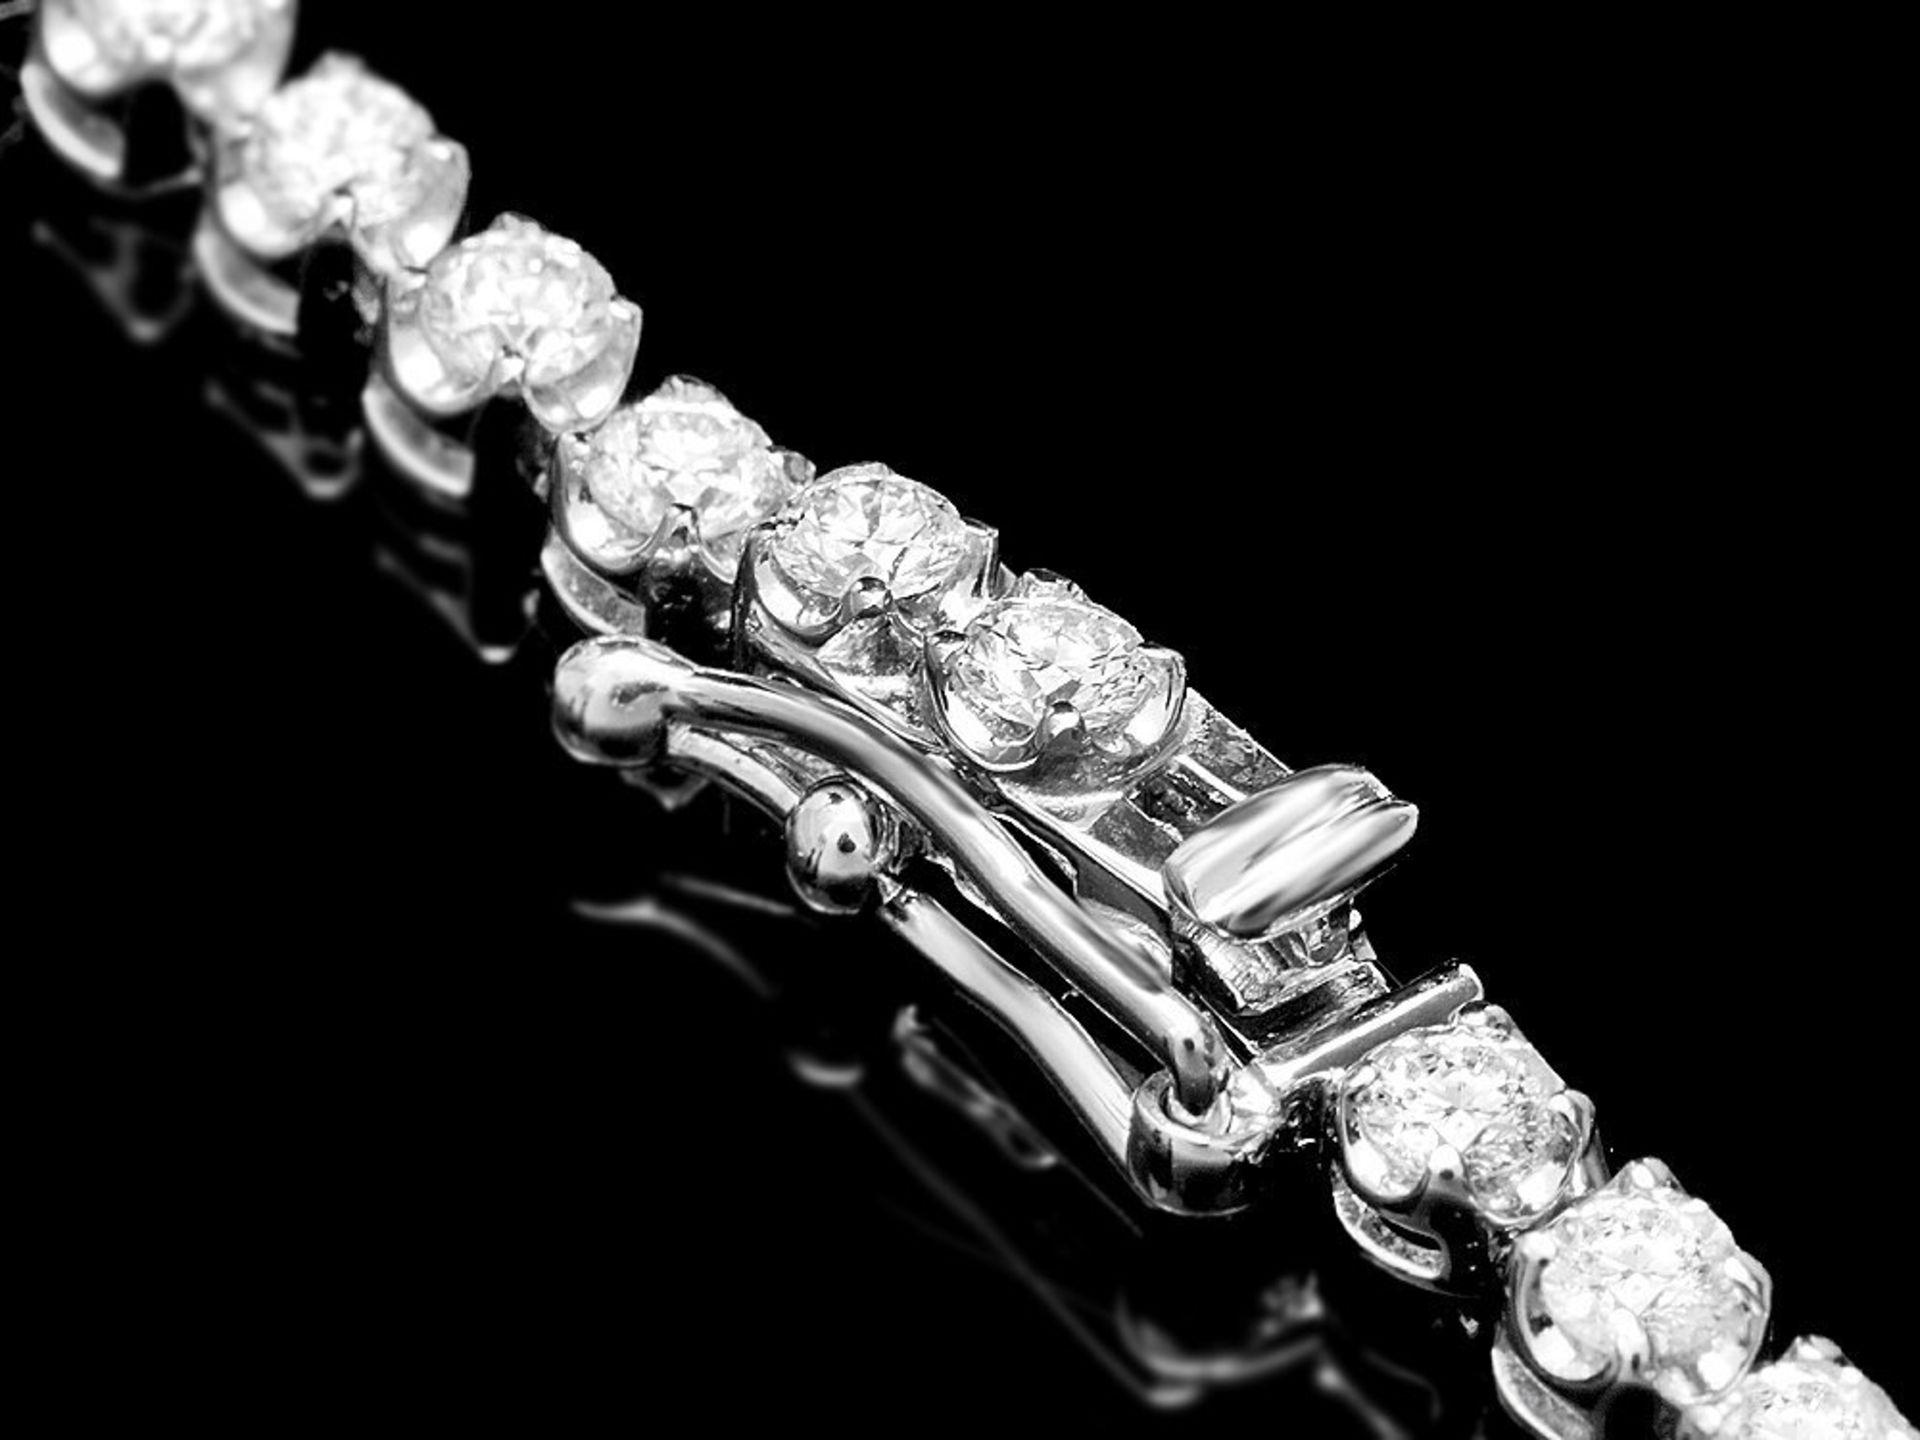 18k White Gold 6.50ct Diamond Necklace - Image 2 of 3